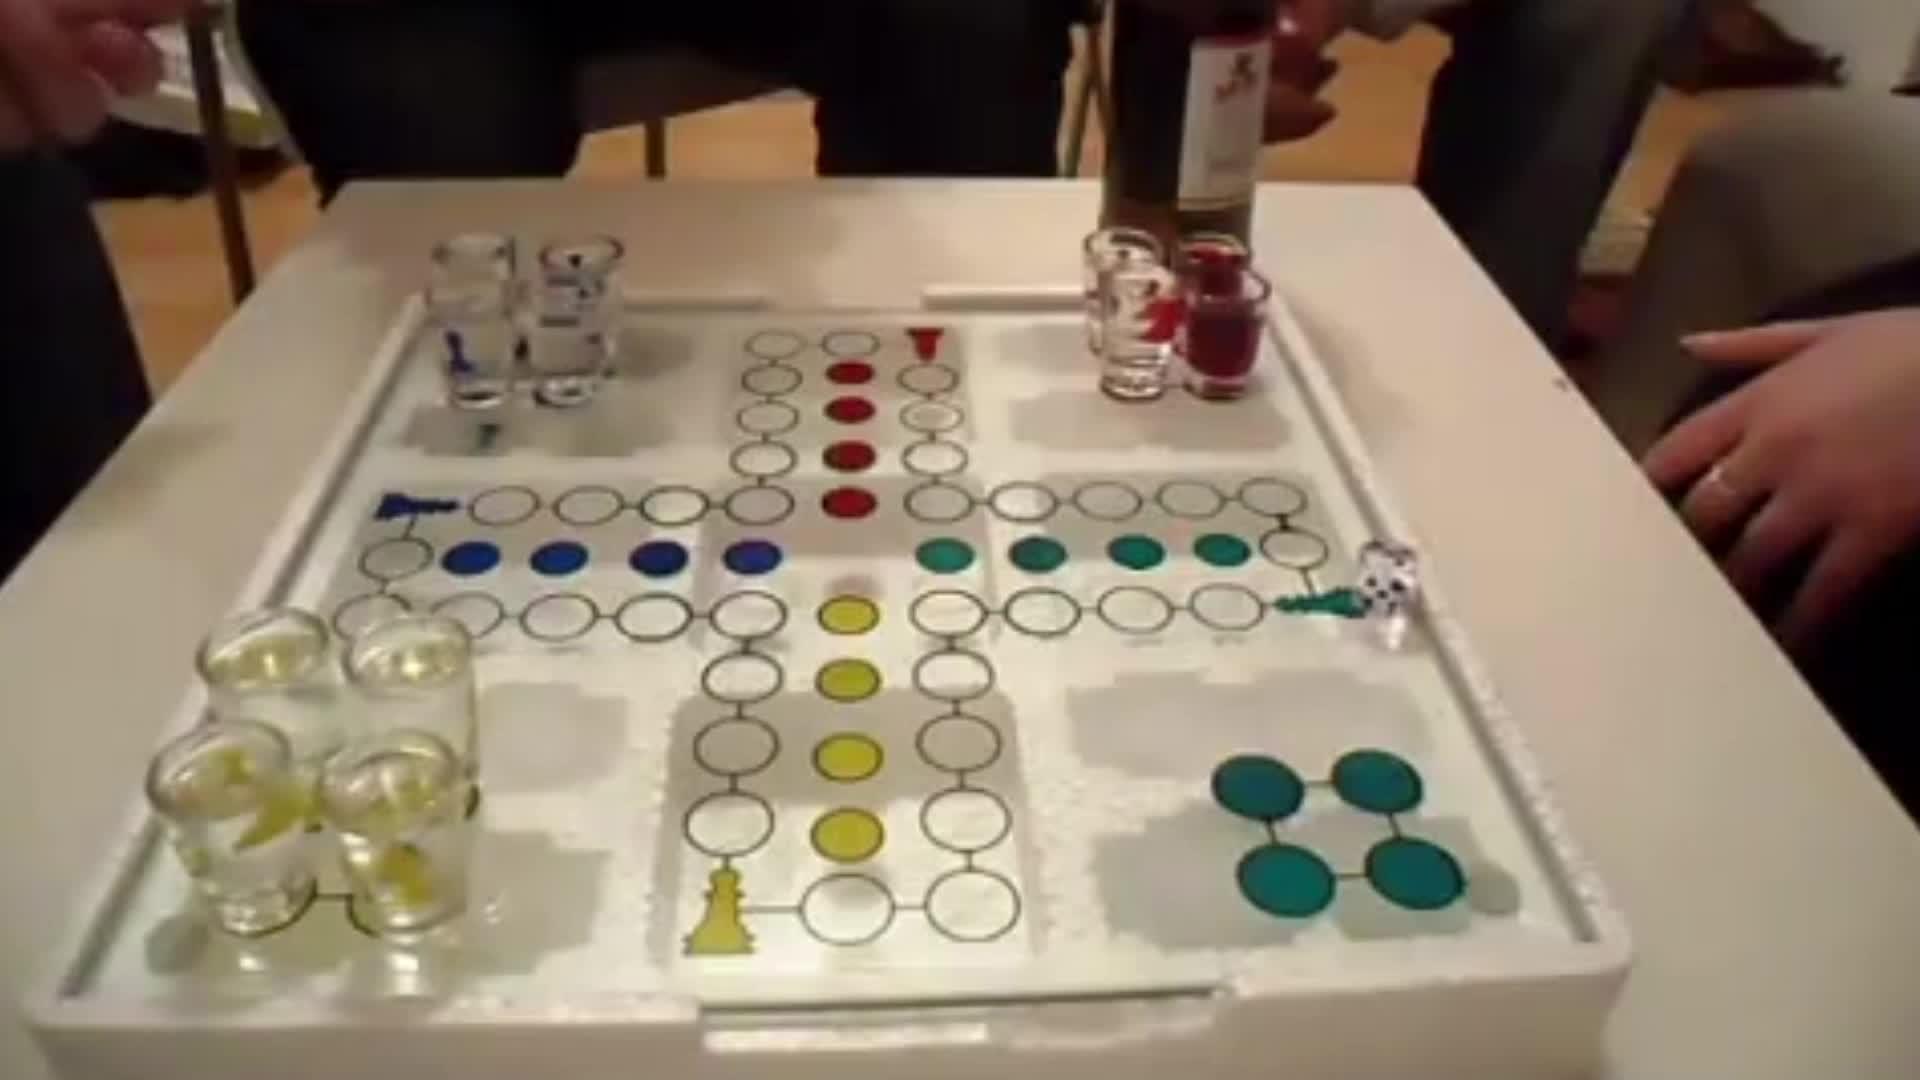 Speelgoed Stop Ludo Drinking Game (Parcheesi) met 16 Borrelglaasjes, 2 Dice & Glas Game Board